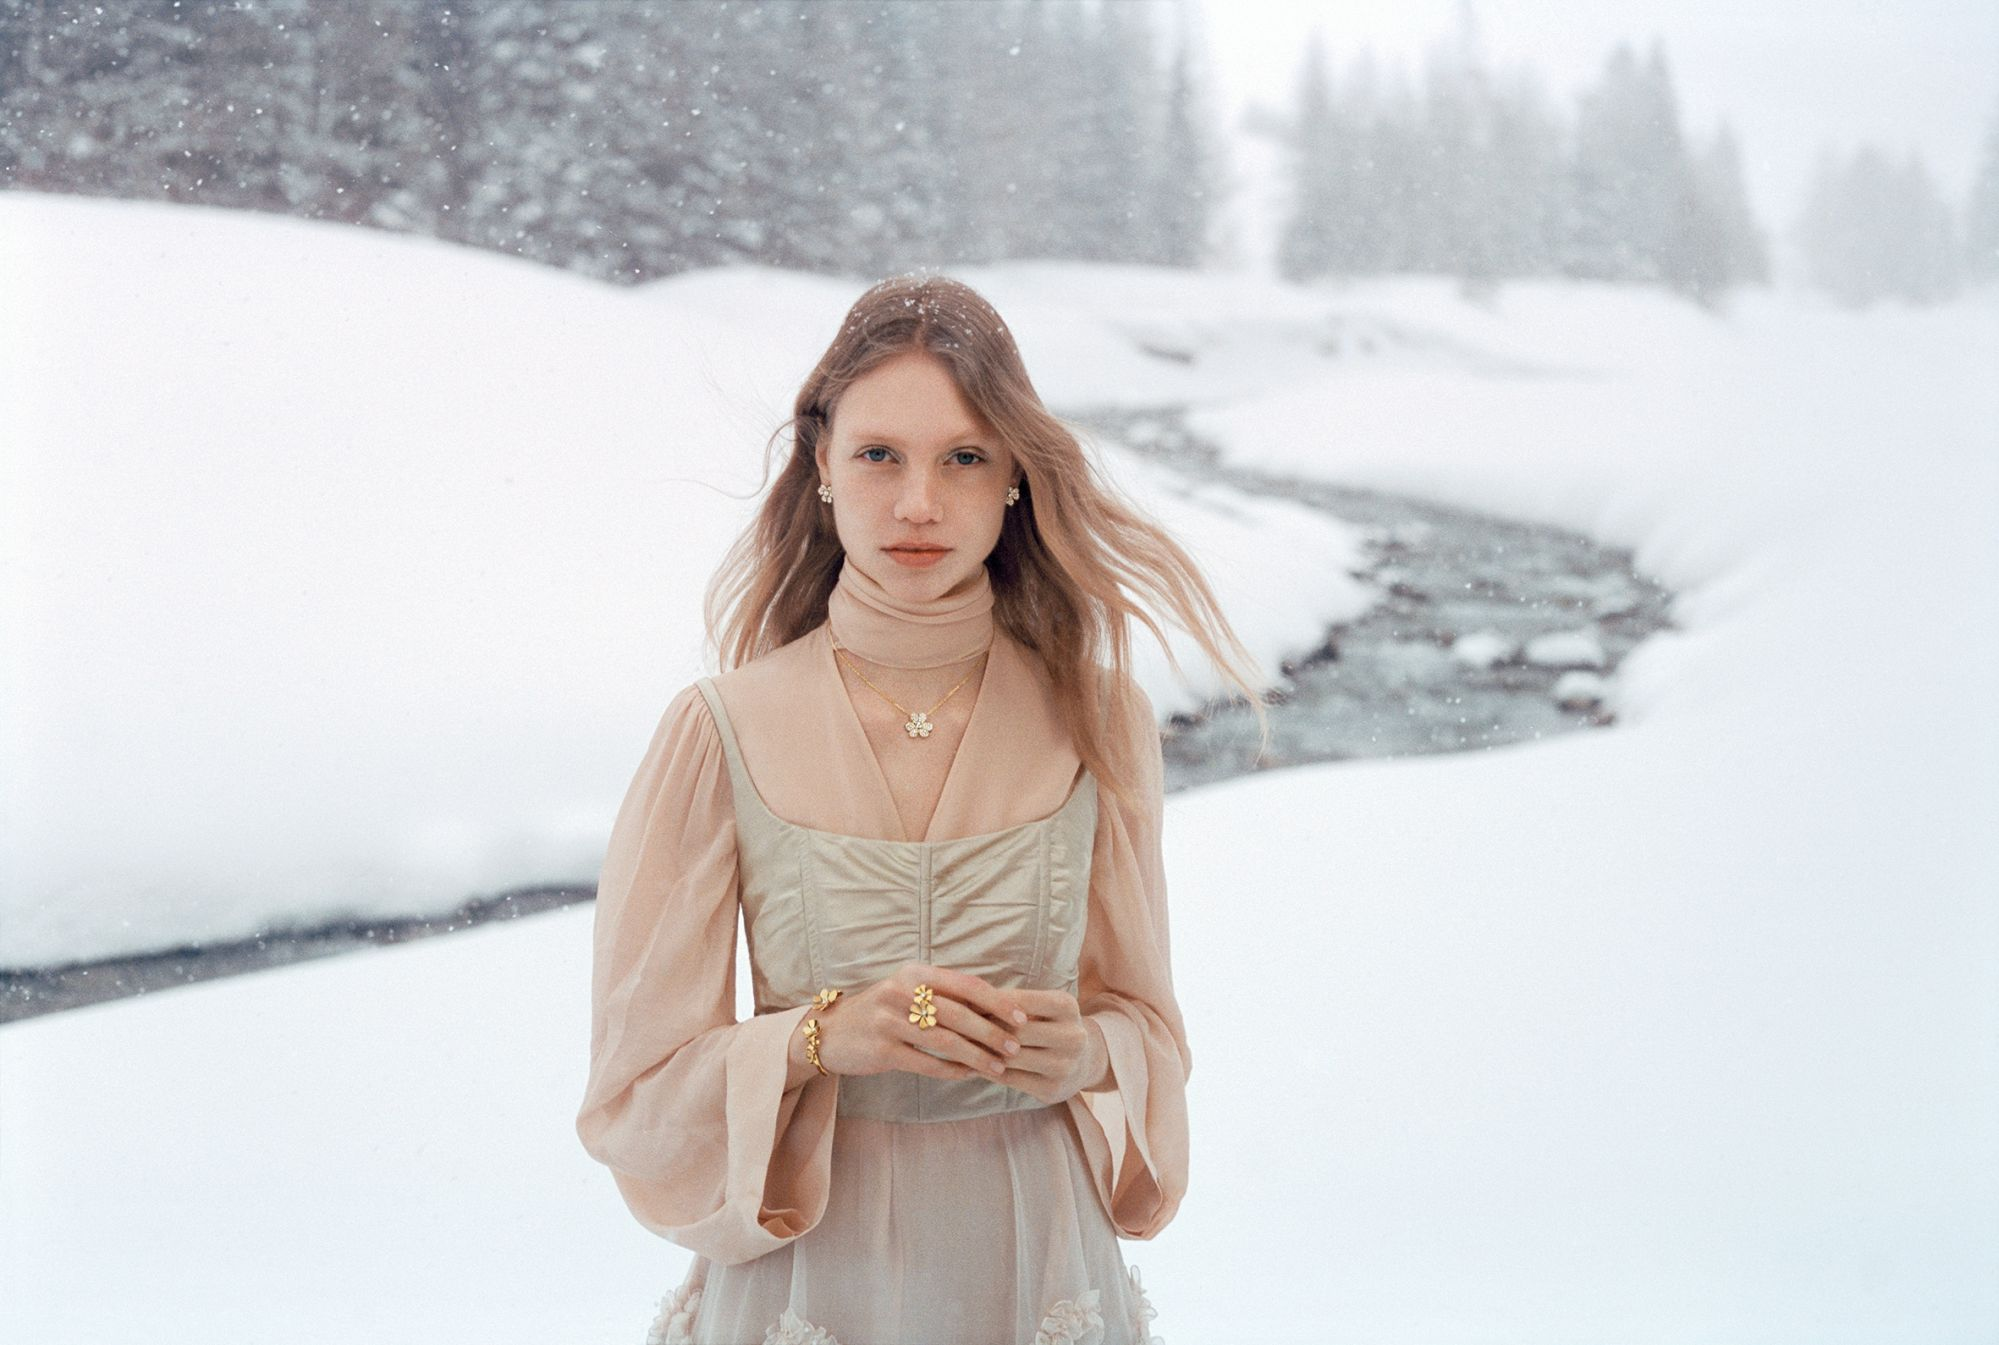 (Image: Olivia Bee for Van Cleef & Arpels)